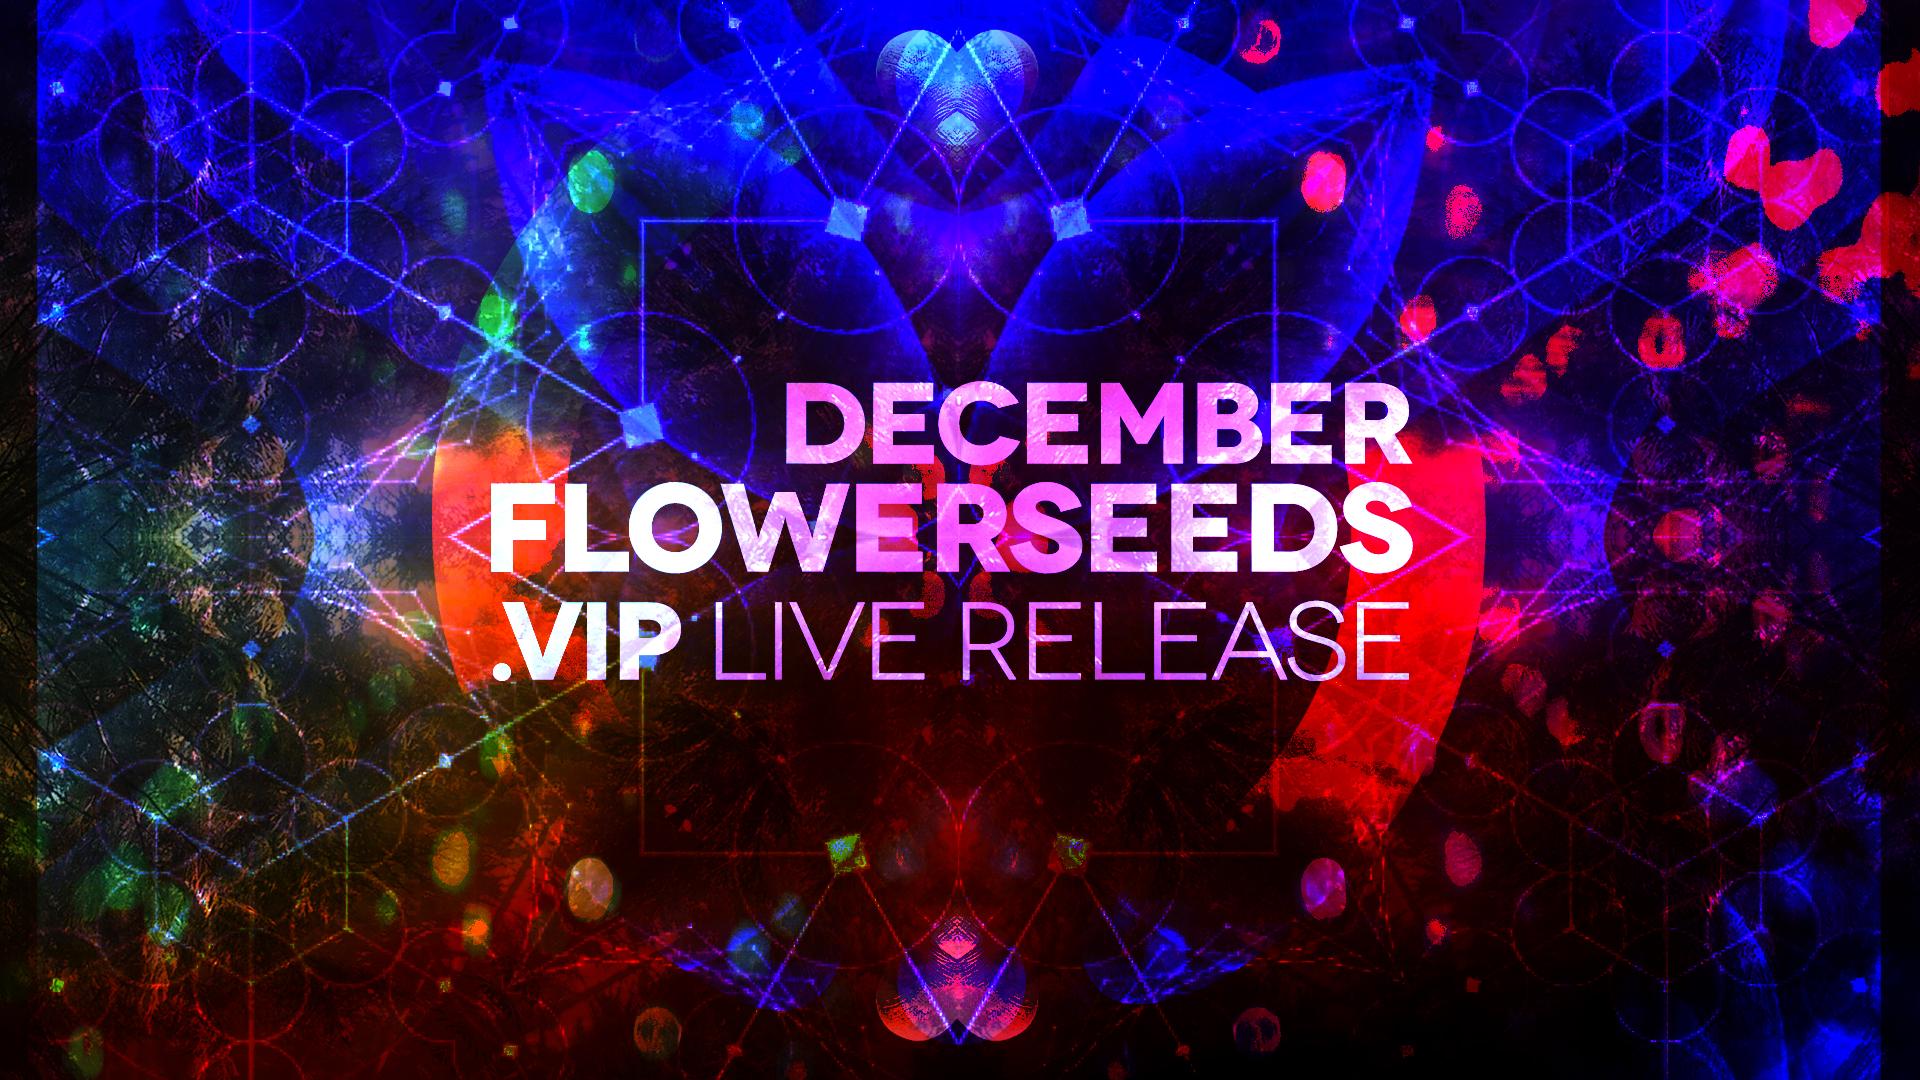 20181207-VIP-Dec.jpg